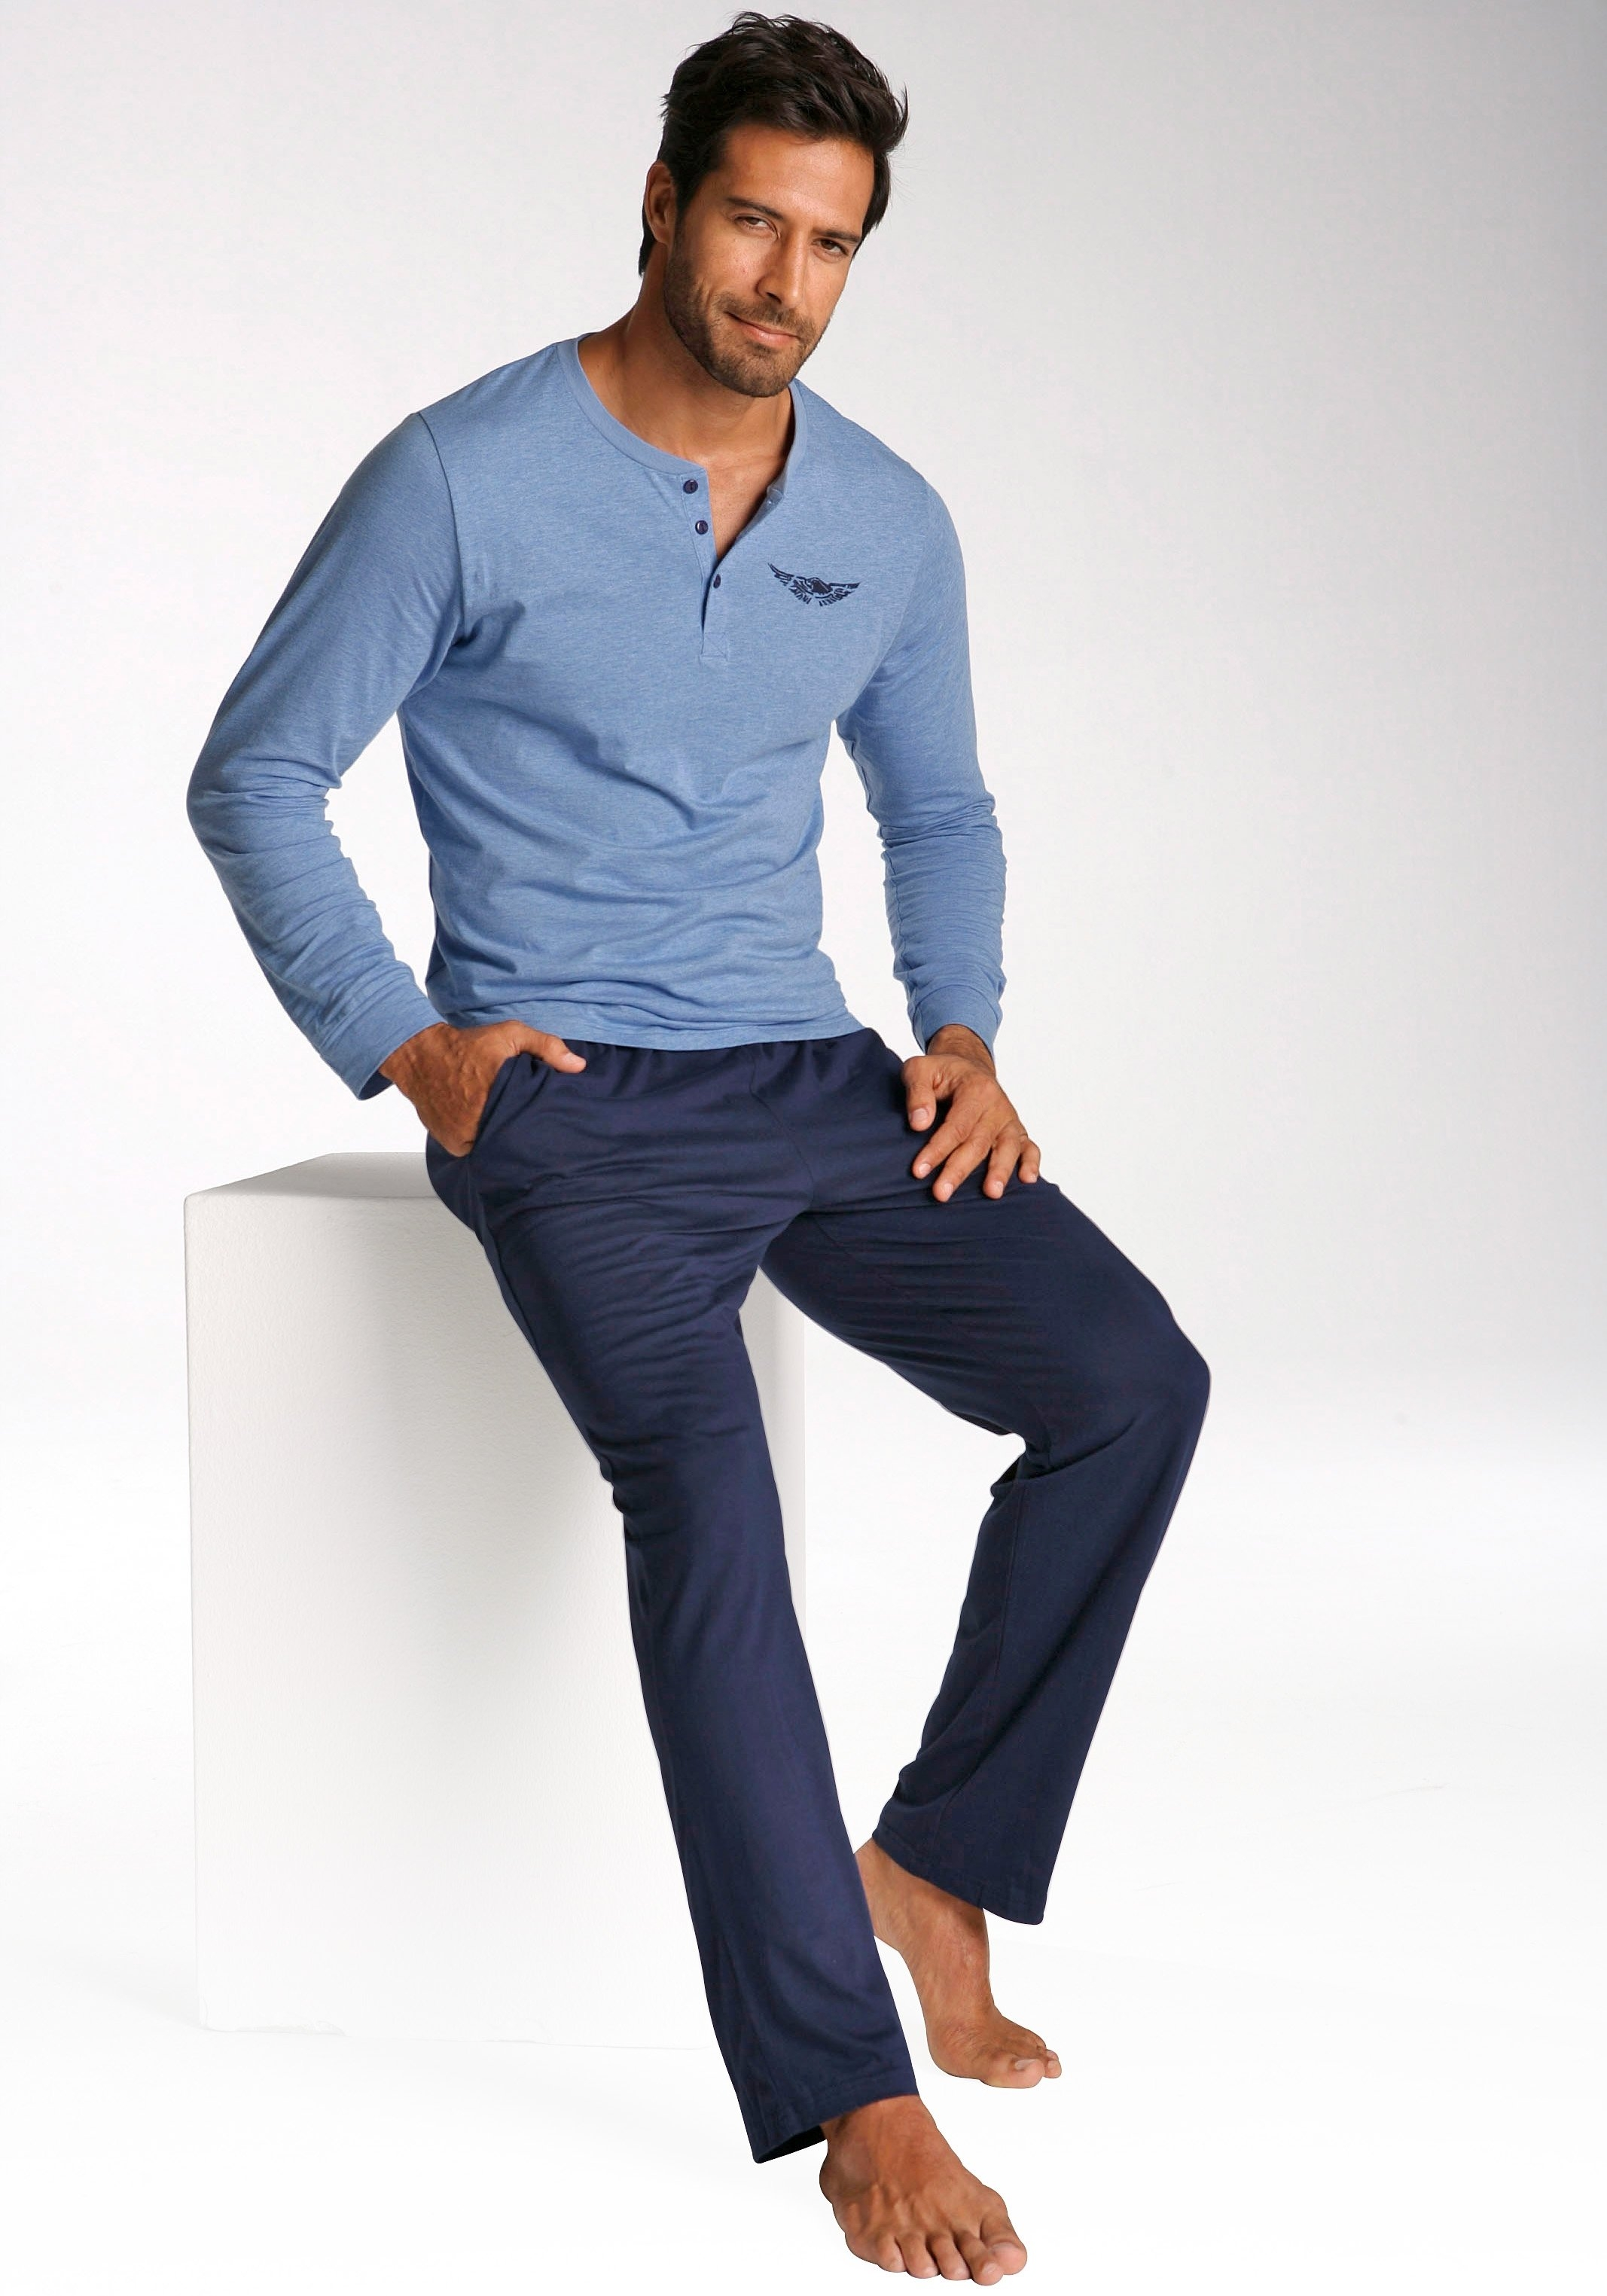 ARIZONA pyjama, in lang model, shirt met knoopsluiting en logoprint op borsthoogte online kopen op lascana.nl